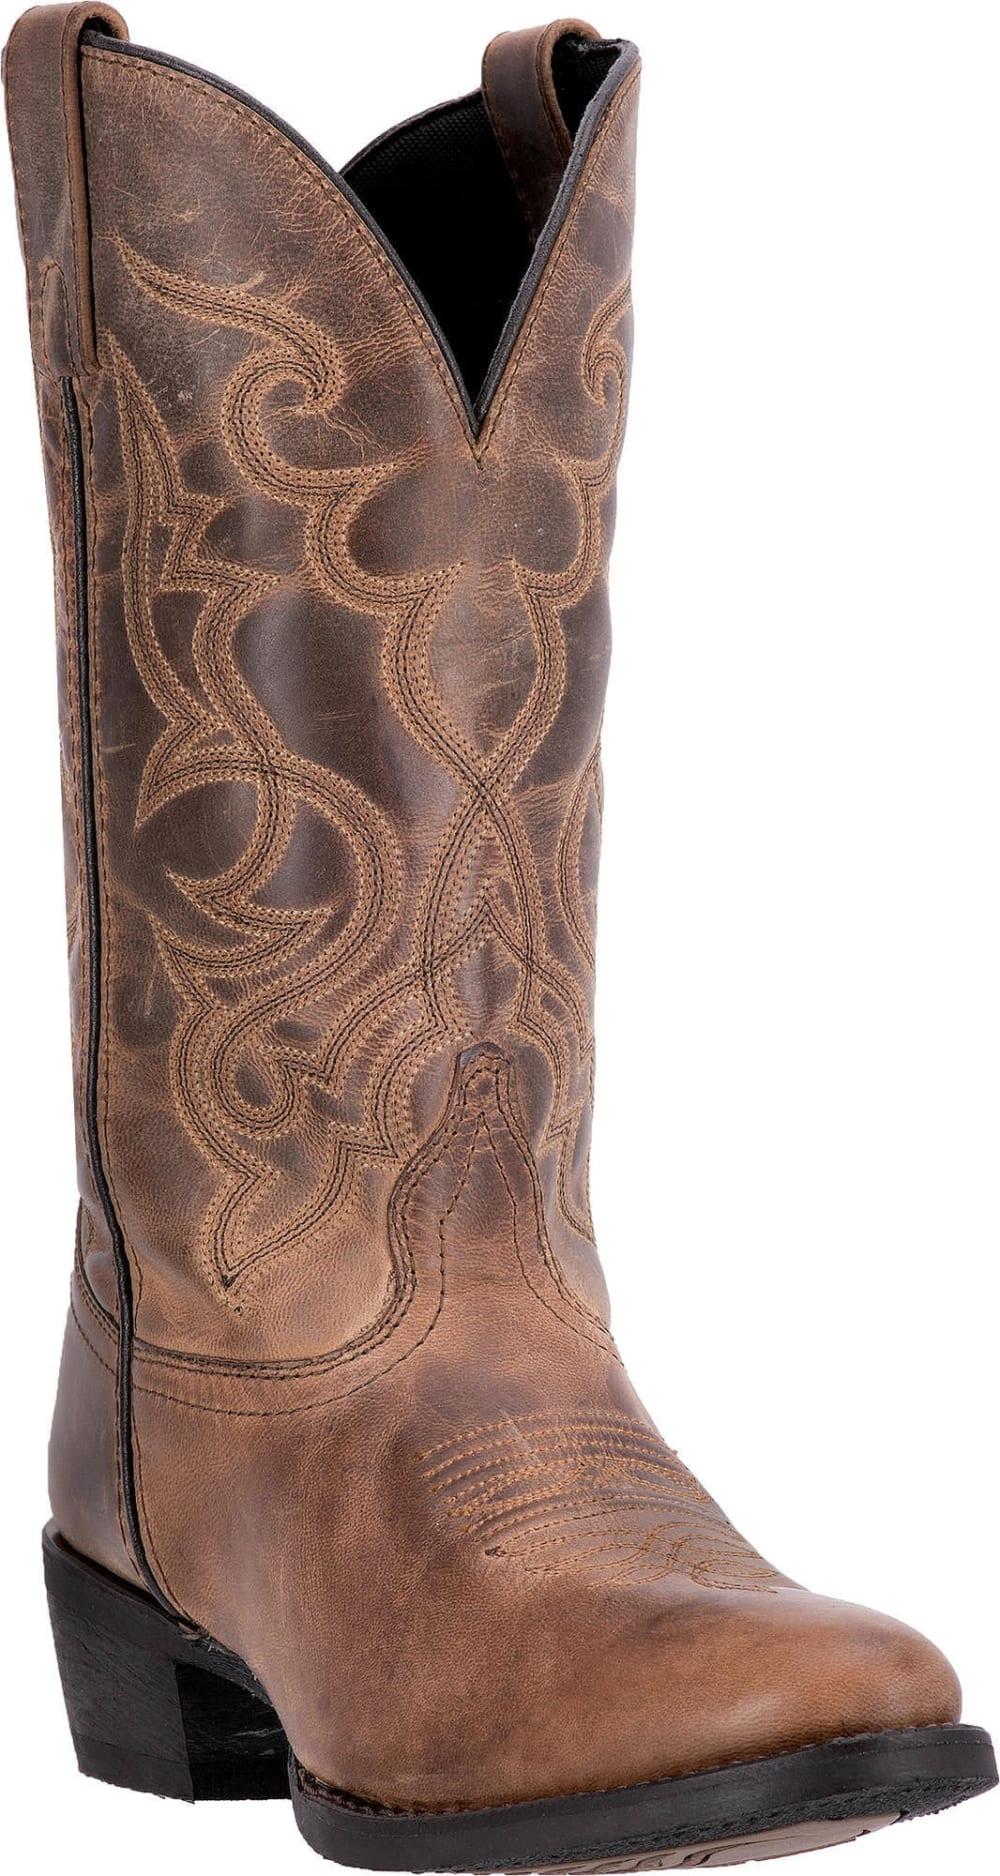 LAREDO Women's Maddie Cowboy Boots, Tan, Wide Sizes - TAN